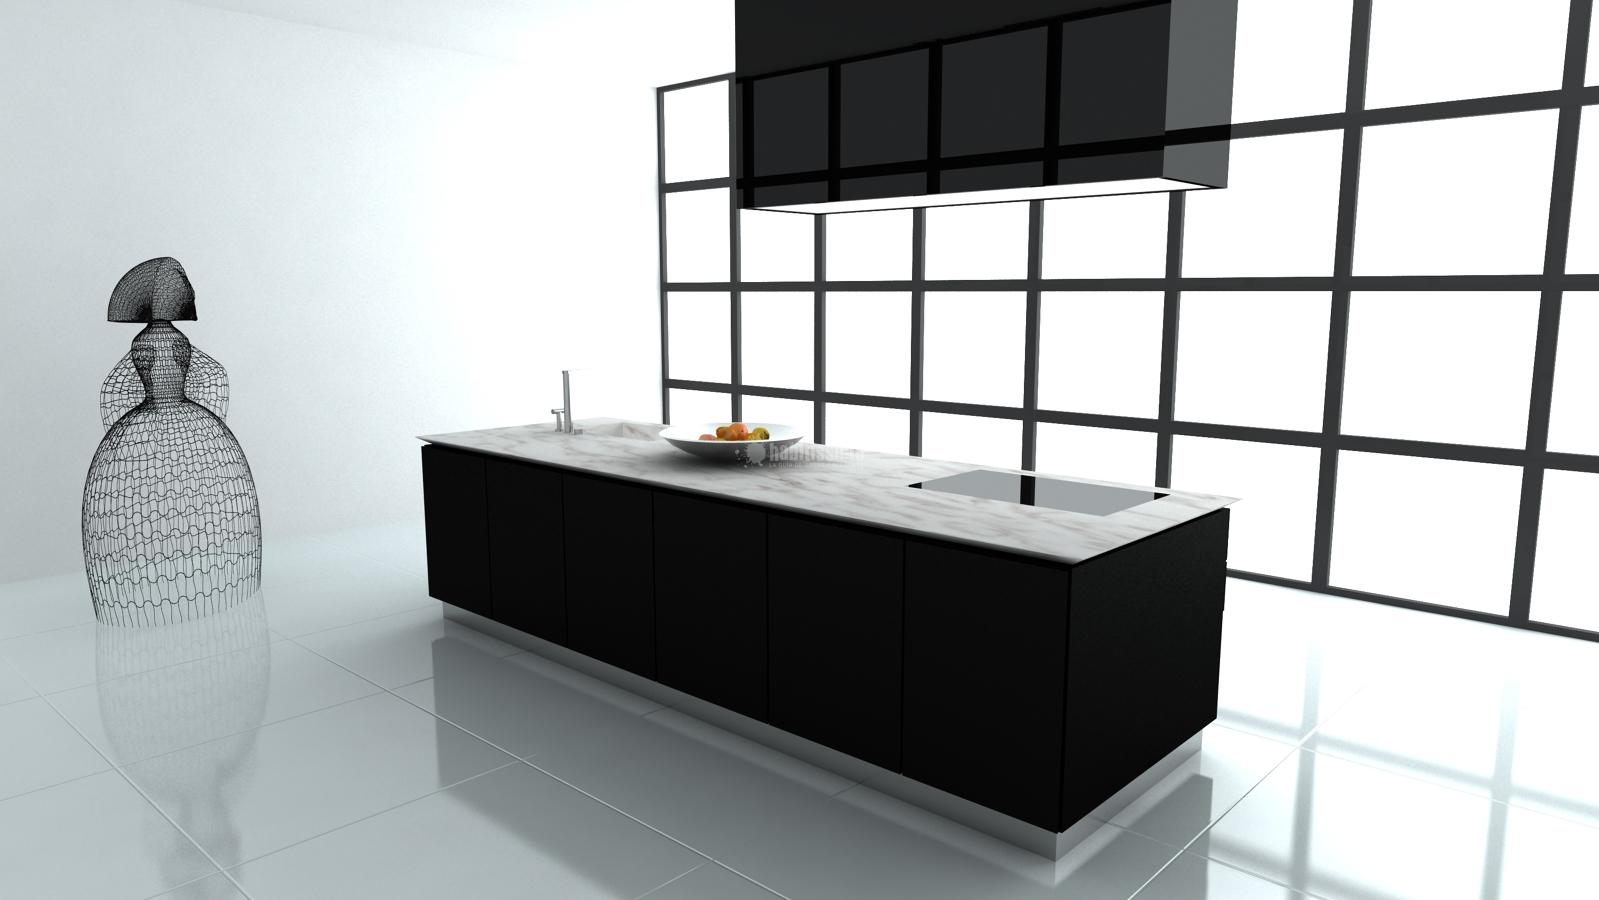 301 moved permanently for Cocinas marbella